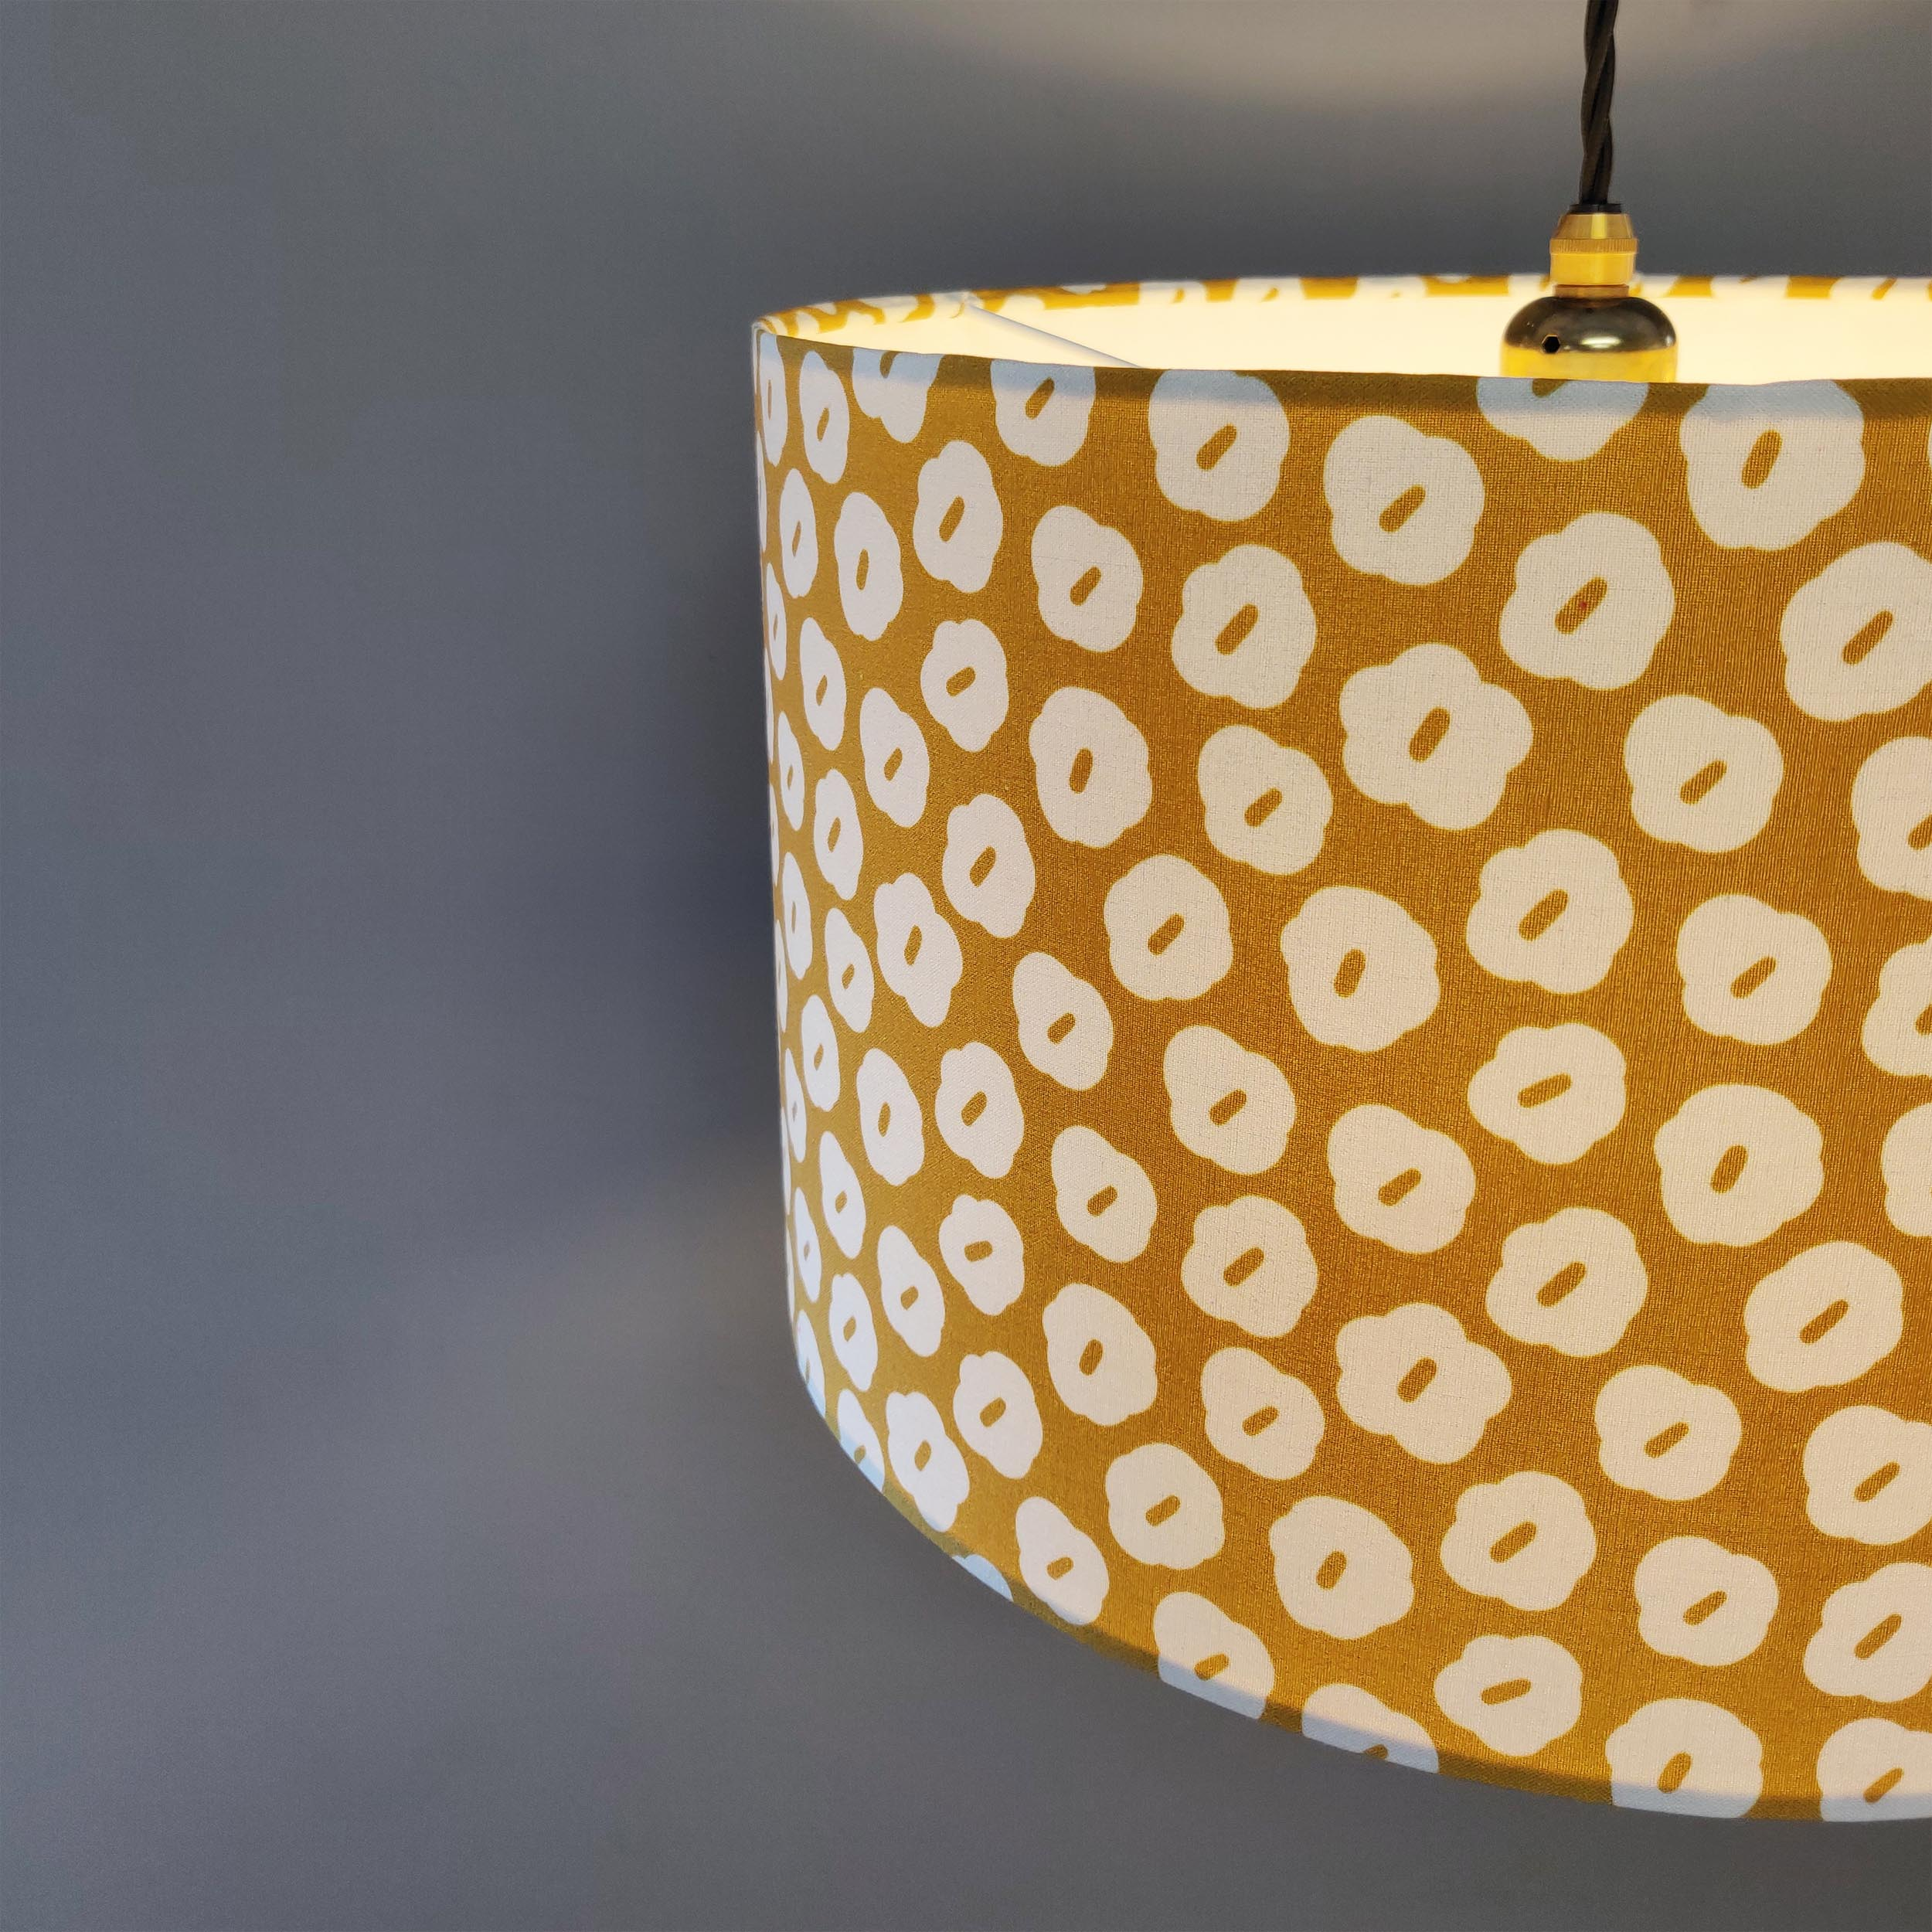 Mustard Yellow Lampshade with White Flower Design